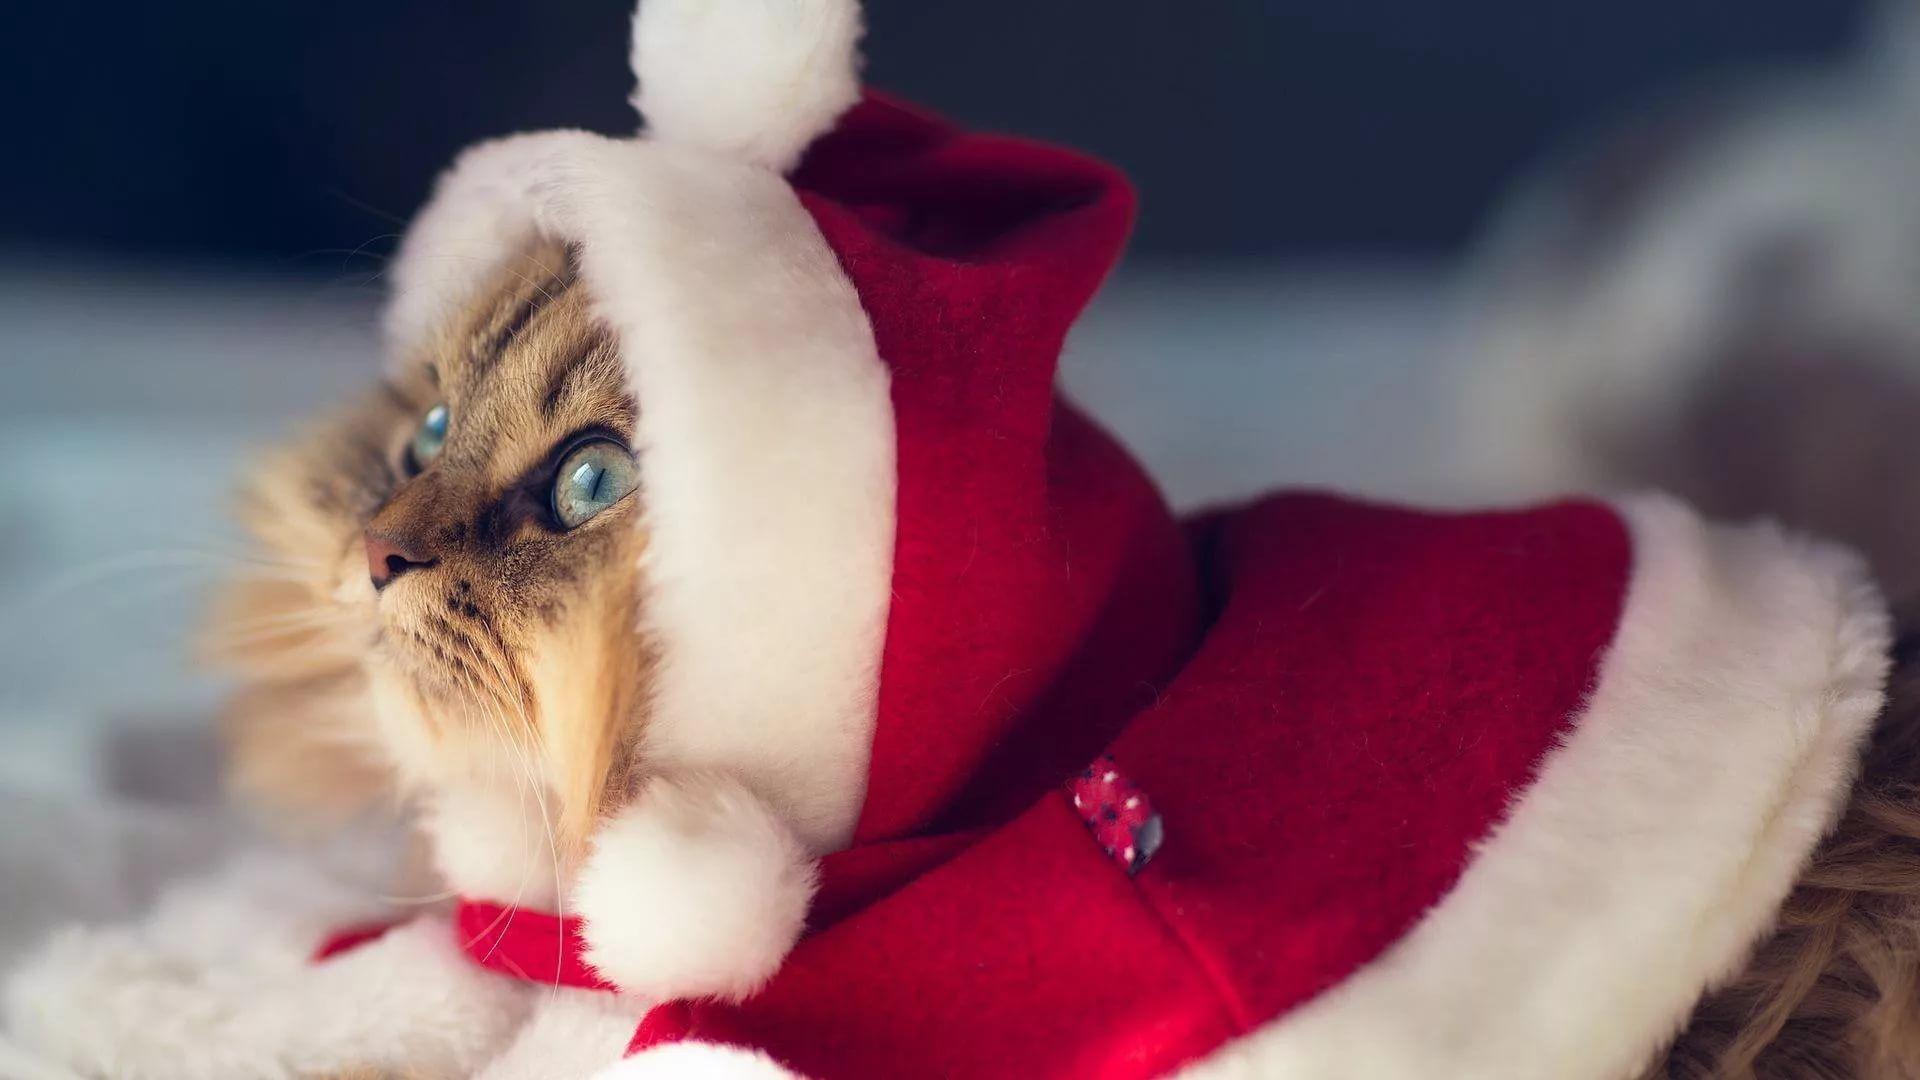 Christmas Cat hd wallpaper 1080